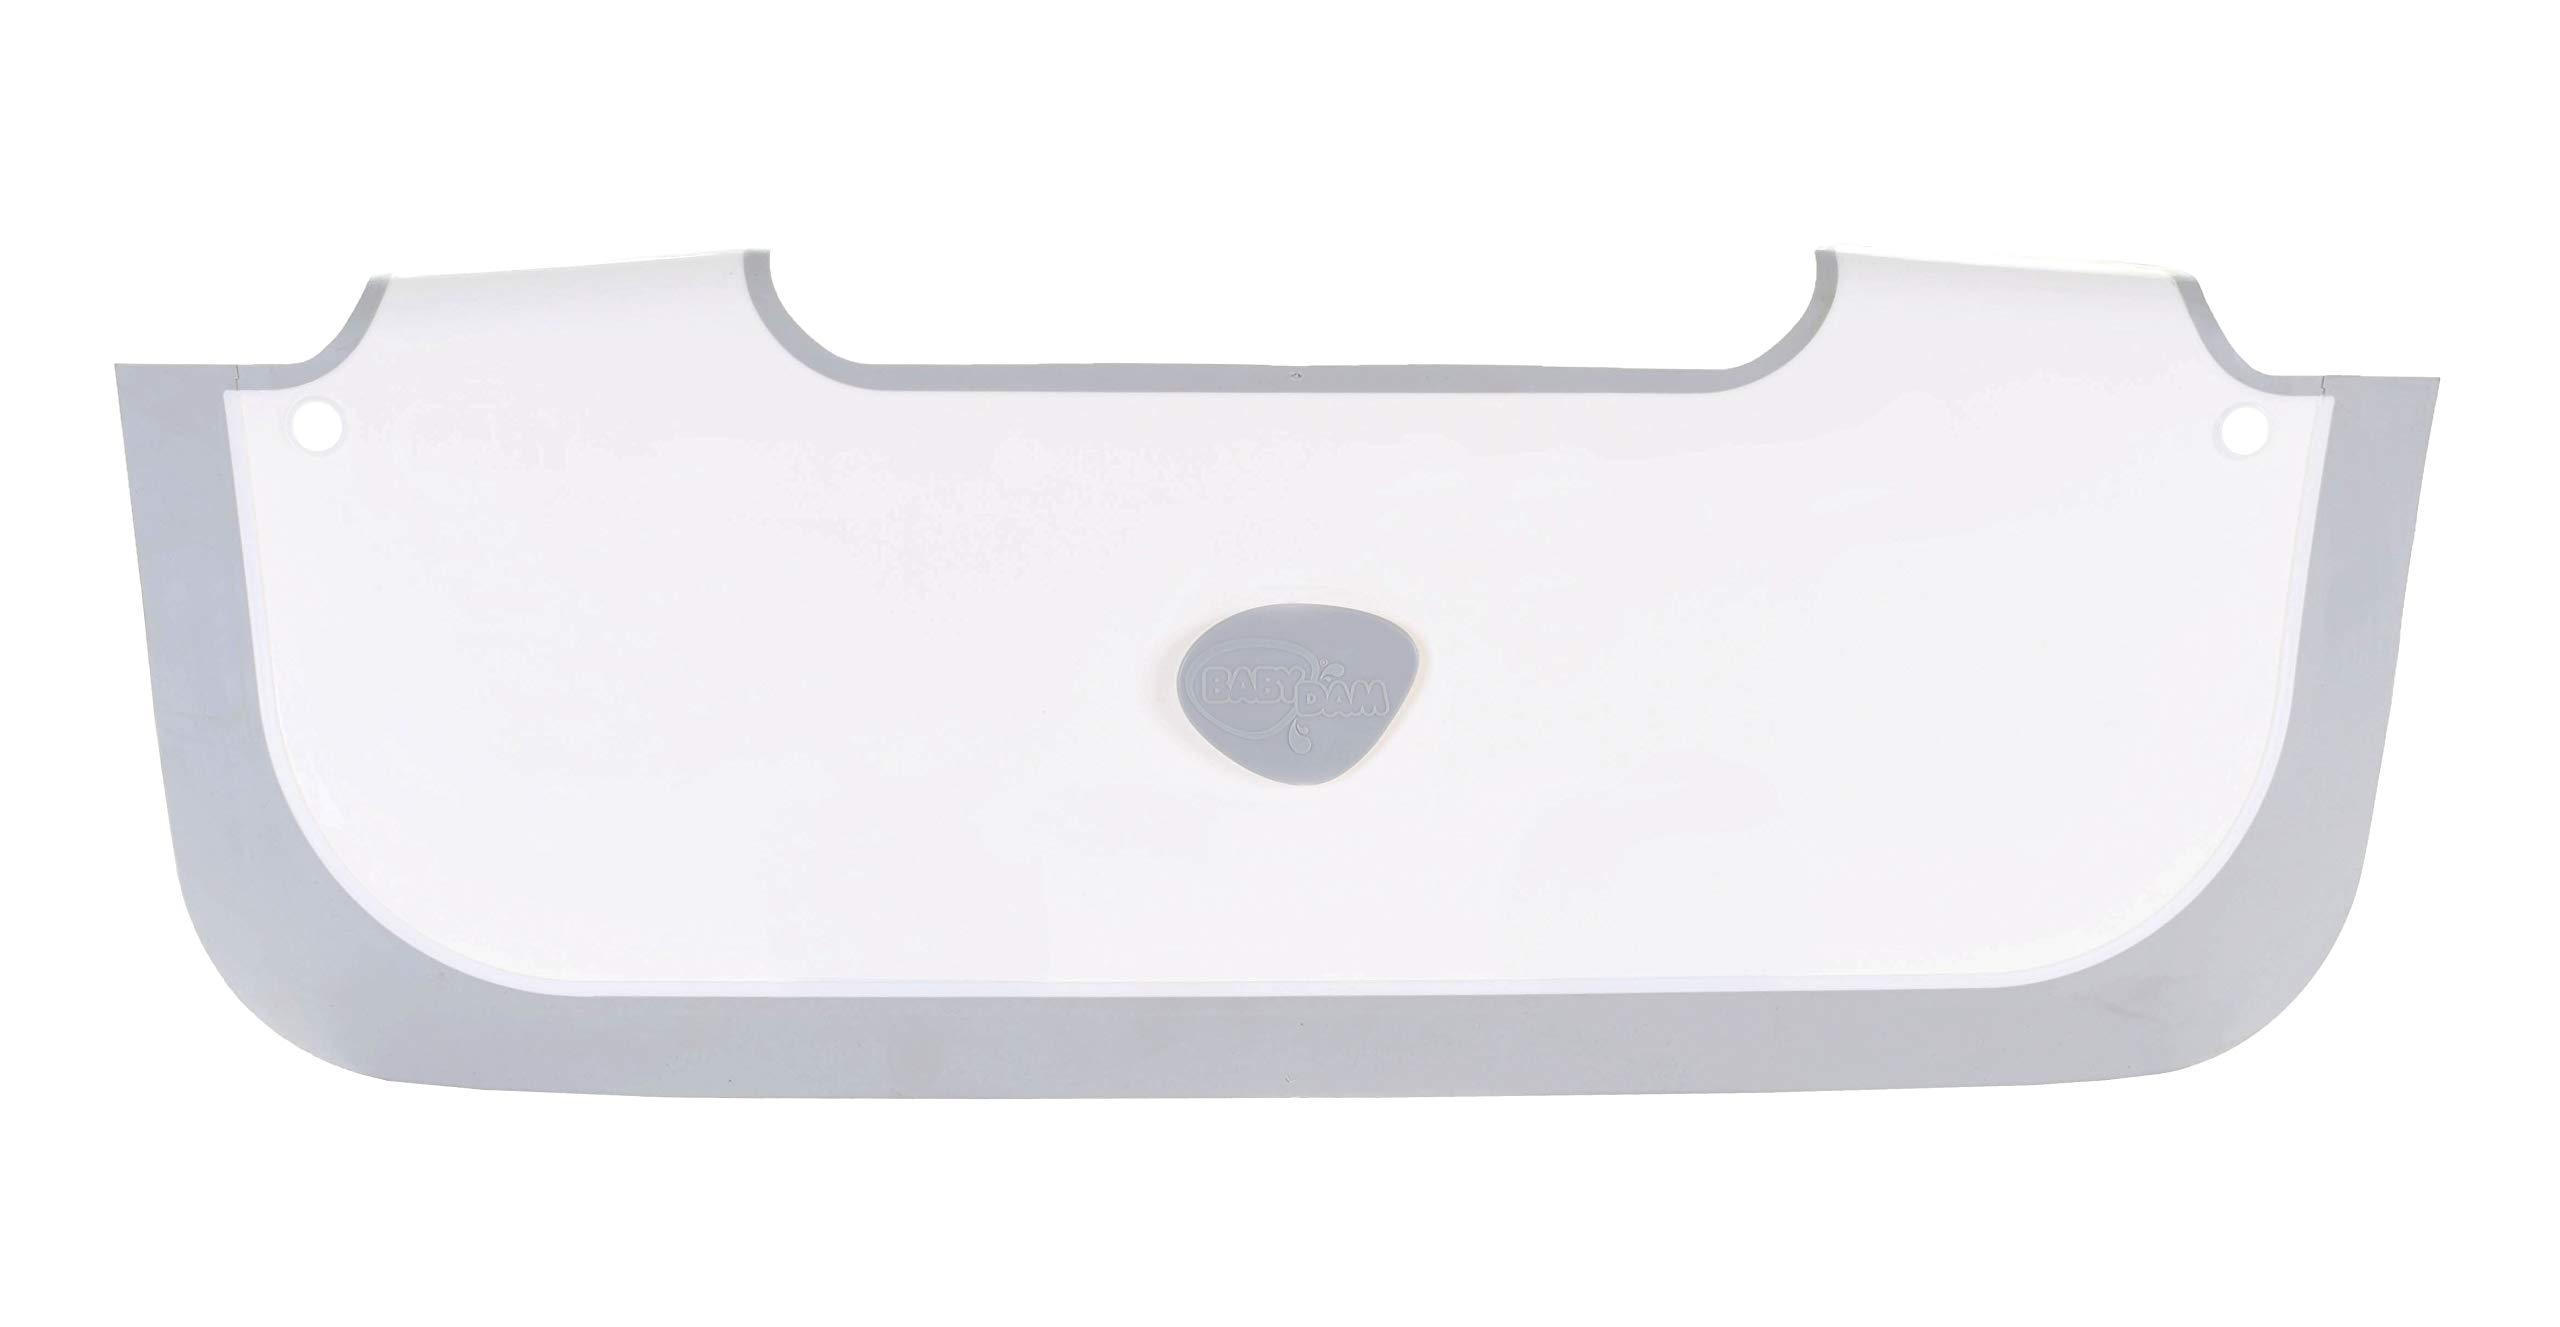 BabyDam Bathwater Barrier, Converts a Standard Non-Textured Bathtub to a Baby Bathtub by Baby Dam